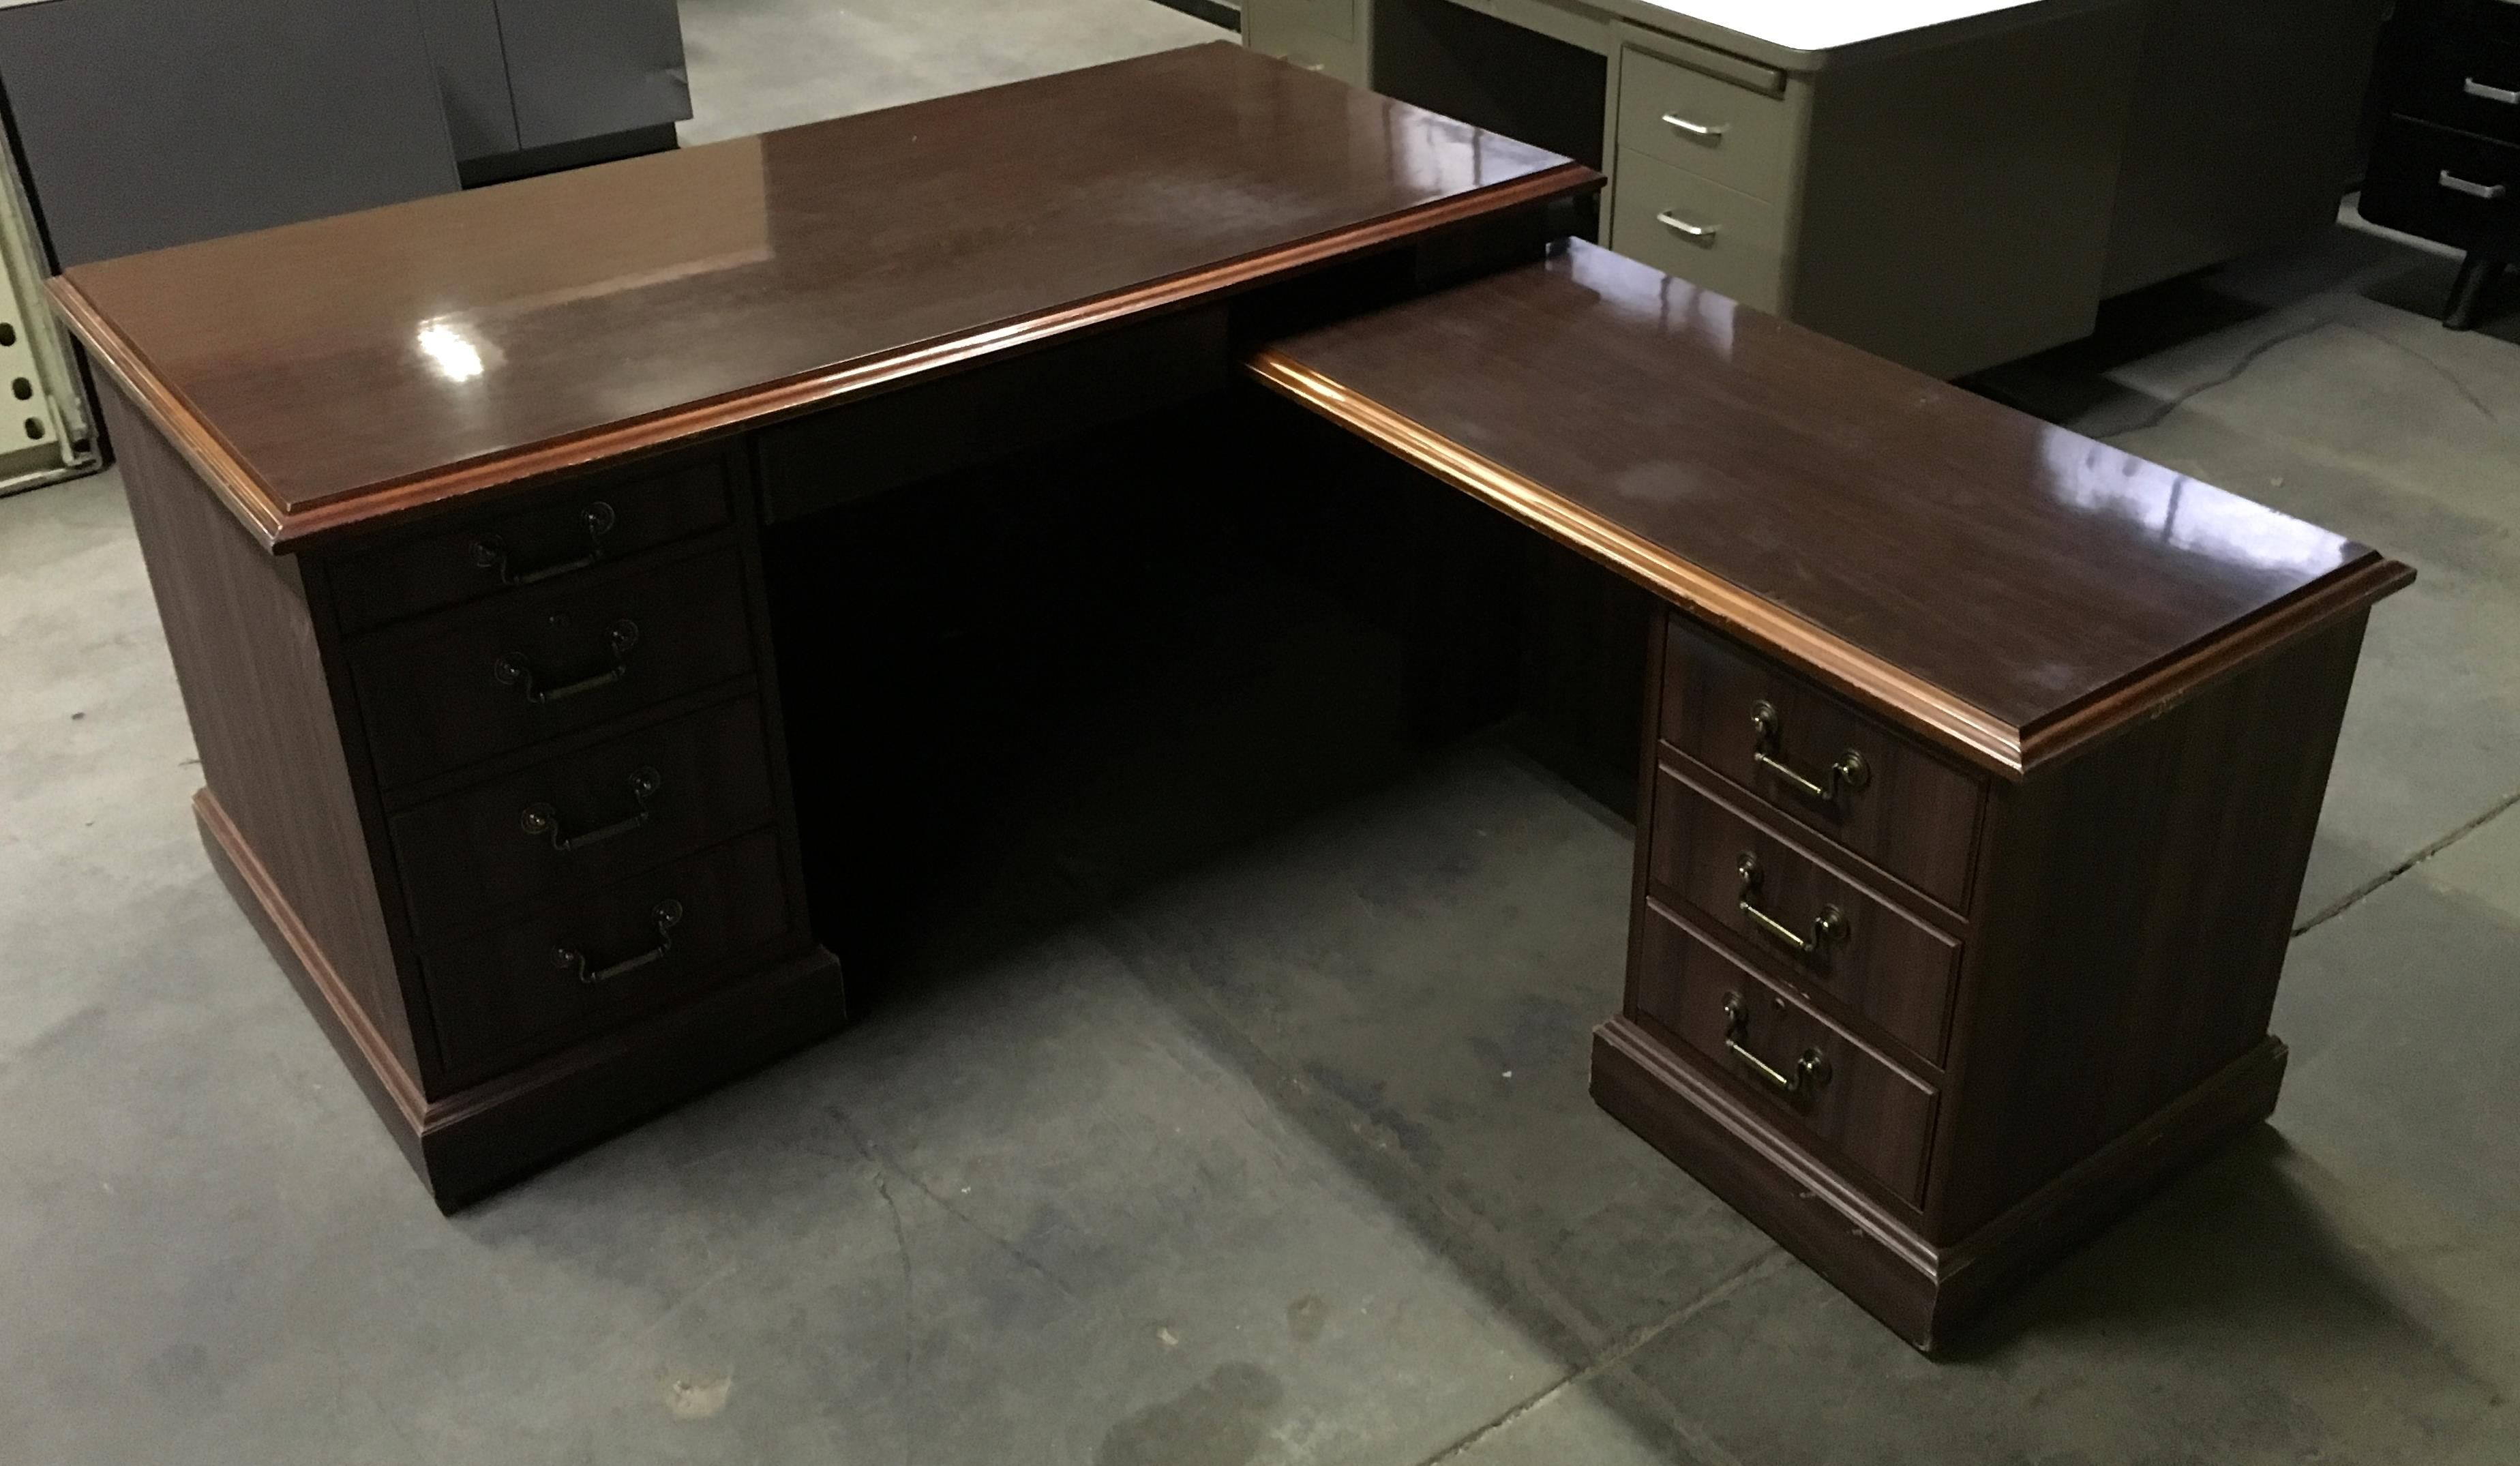 Small Wood L Shaped Desk 259 Http Www Ebay Com Itm 111855319330 Sspagename Strk Meselx It Trksid P3984 M155 Office Furniture Sale L Shaped Desk Furniture